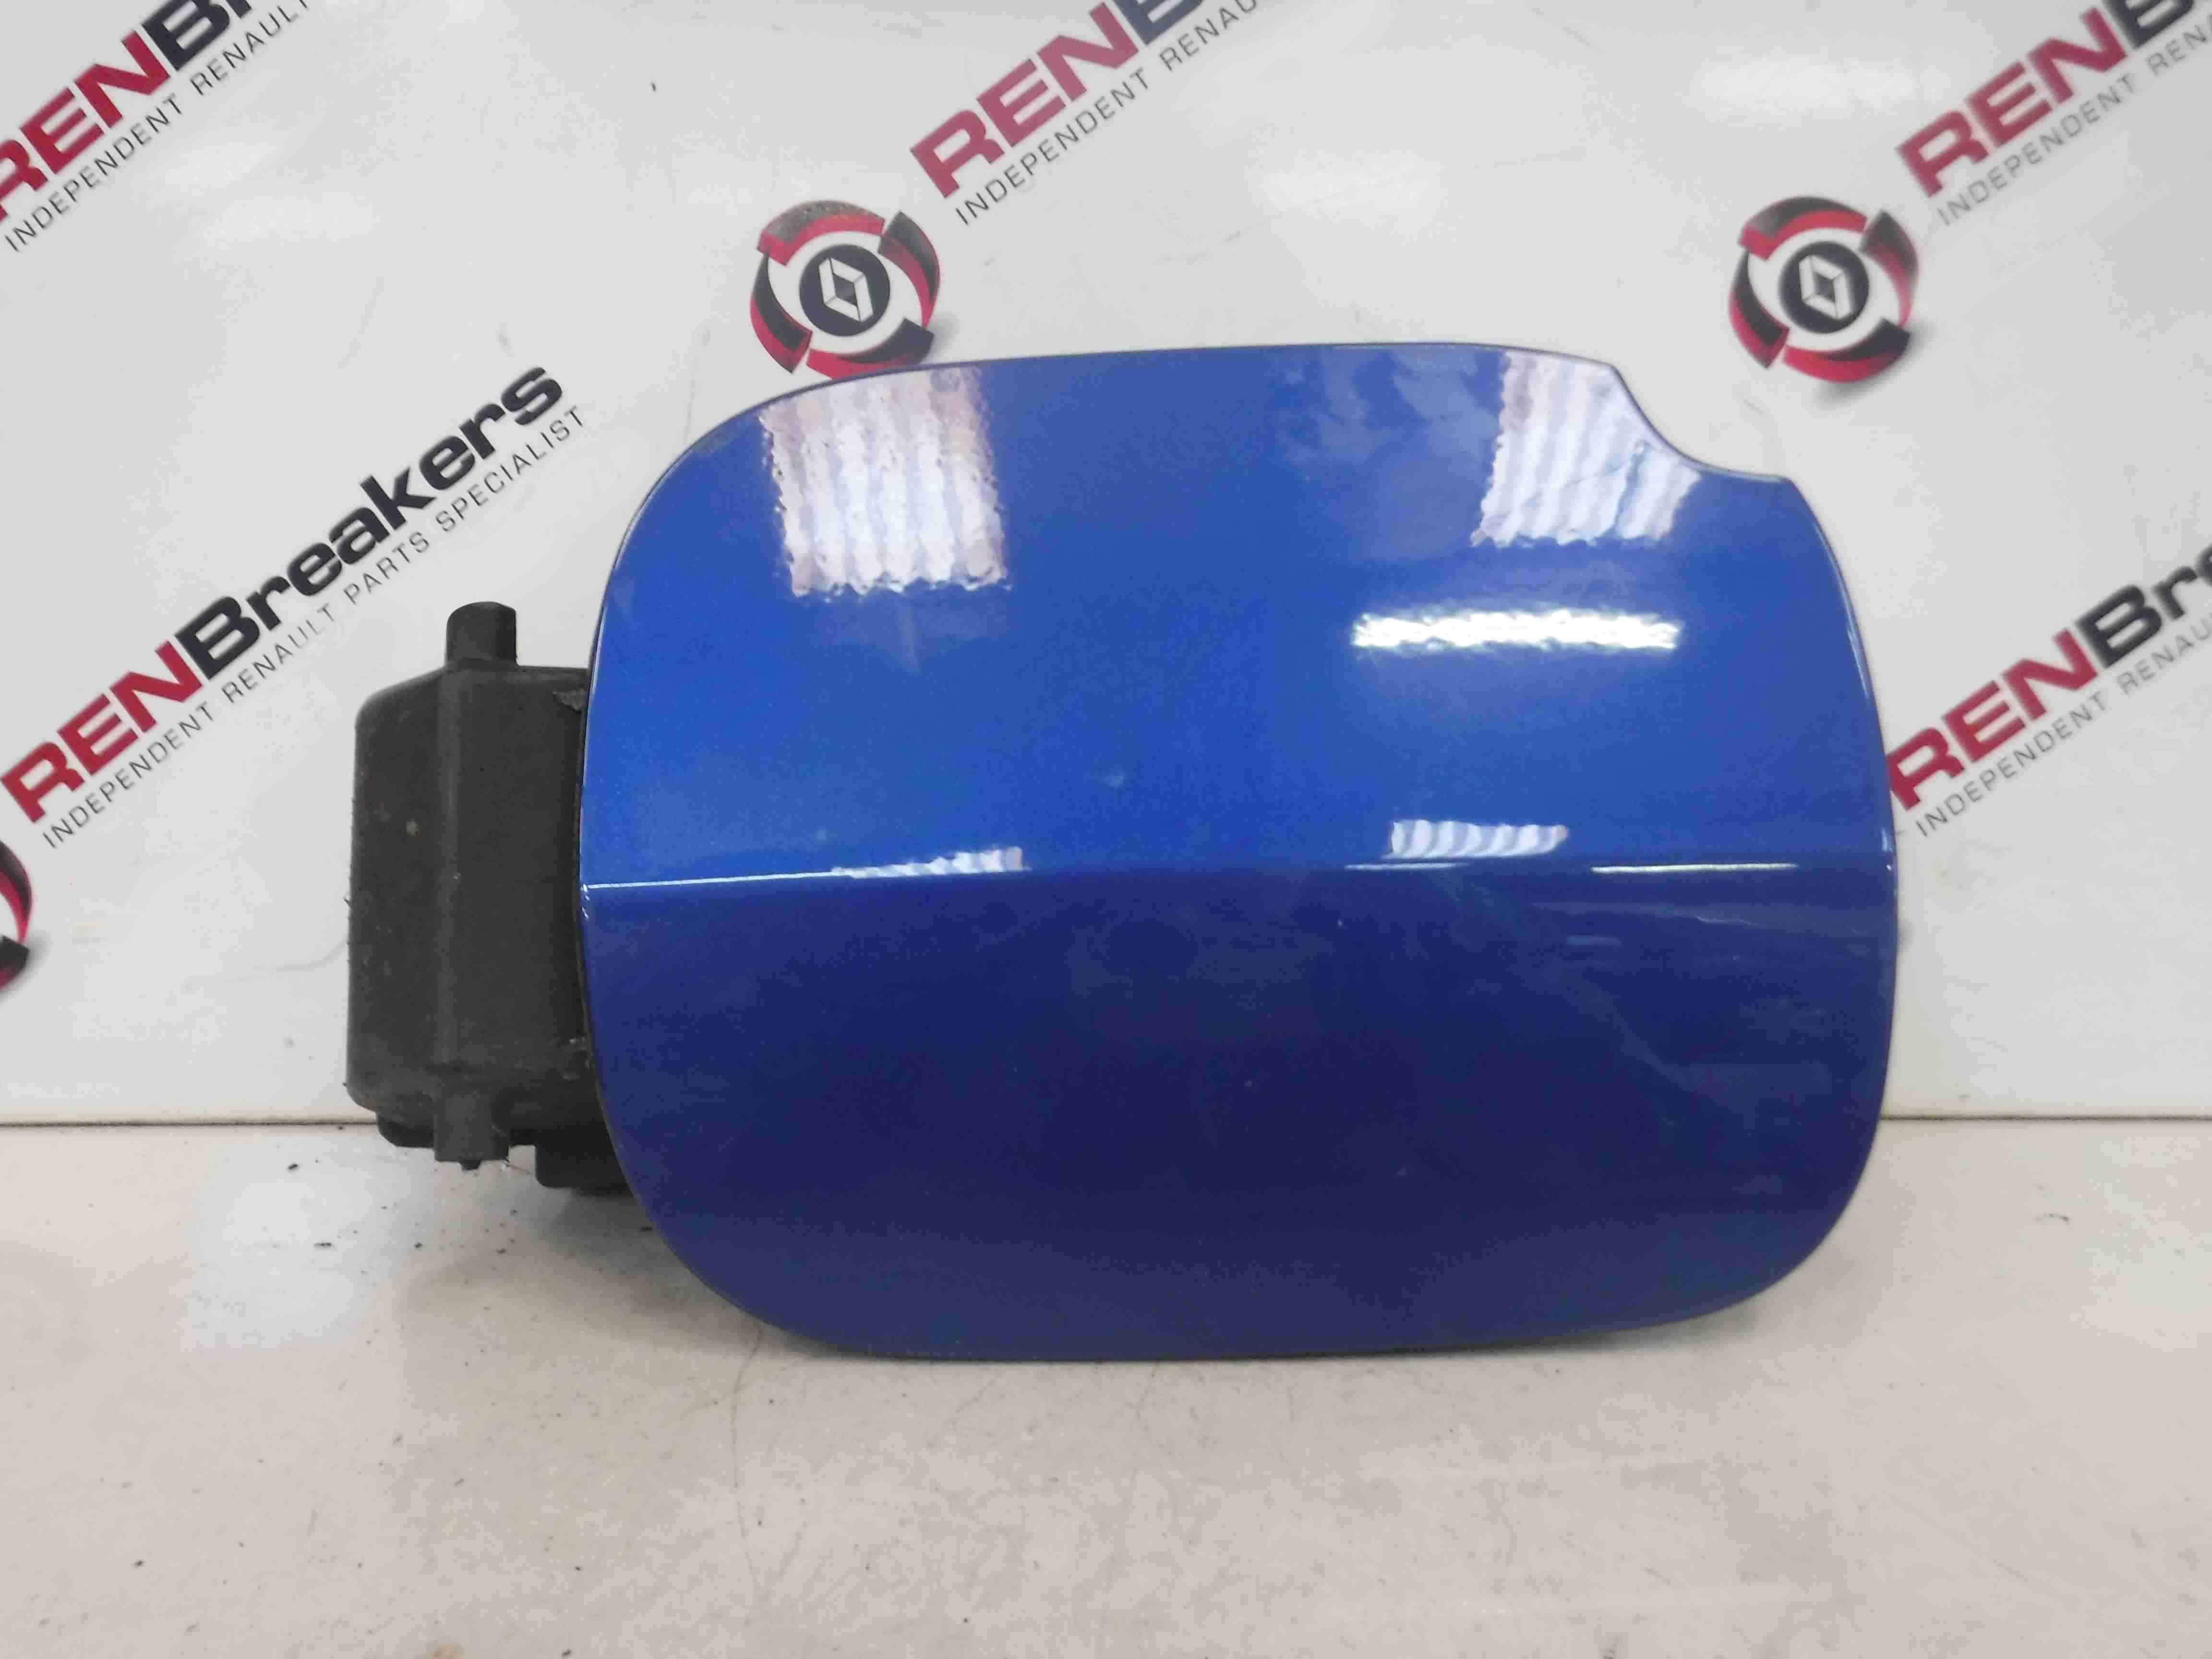 Renault Clio MK3 2005-2009 Fuel Flap Cover + Hinge Blue TERNA  8200290088